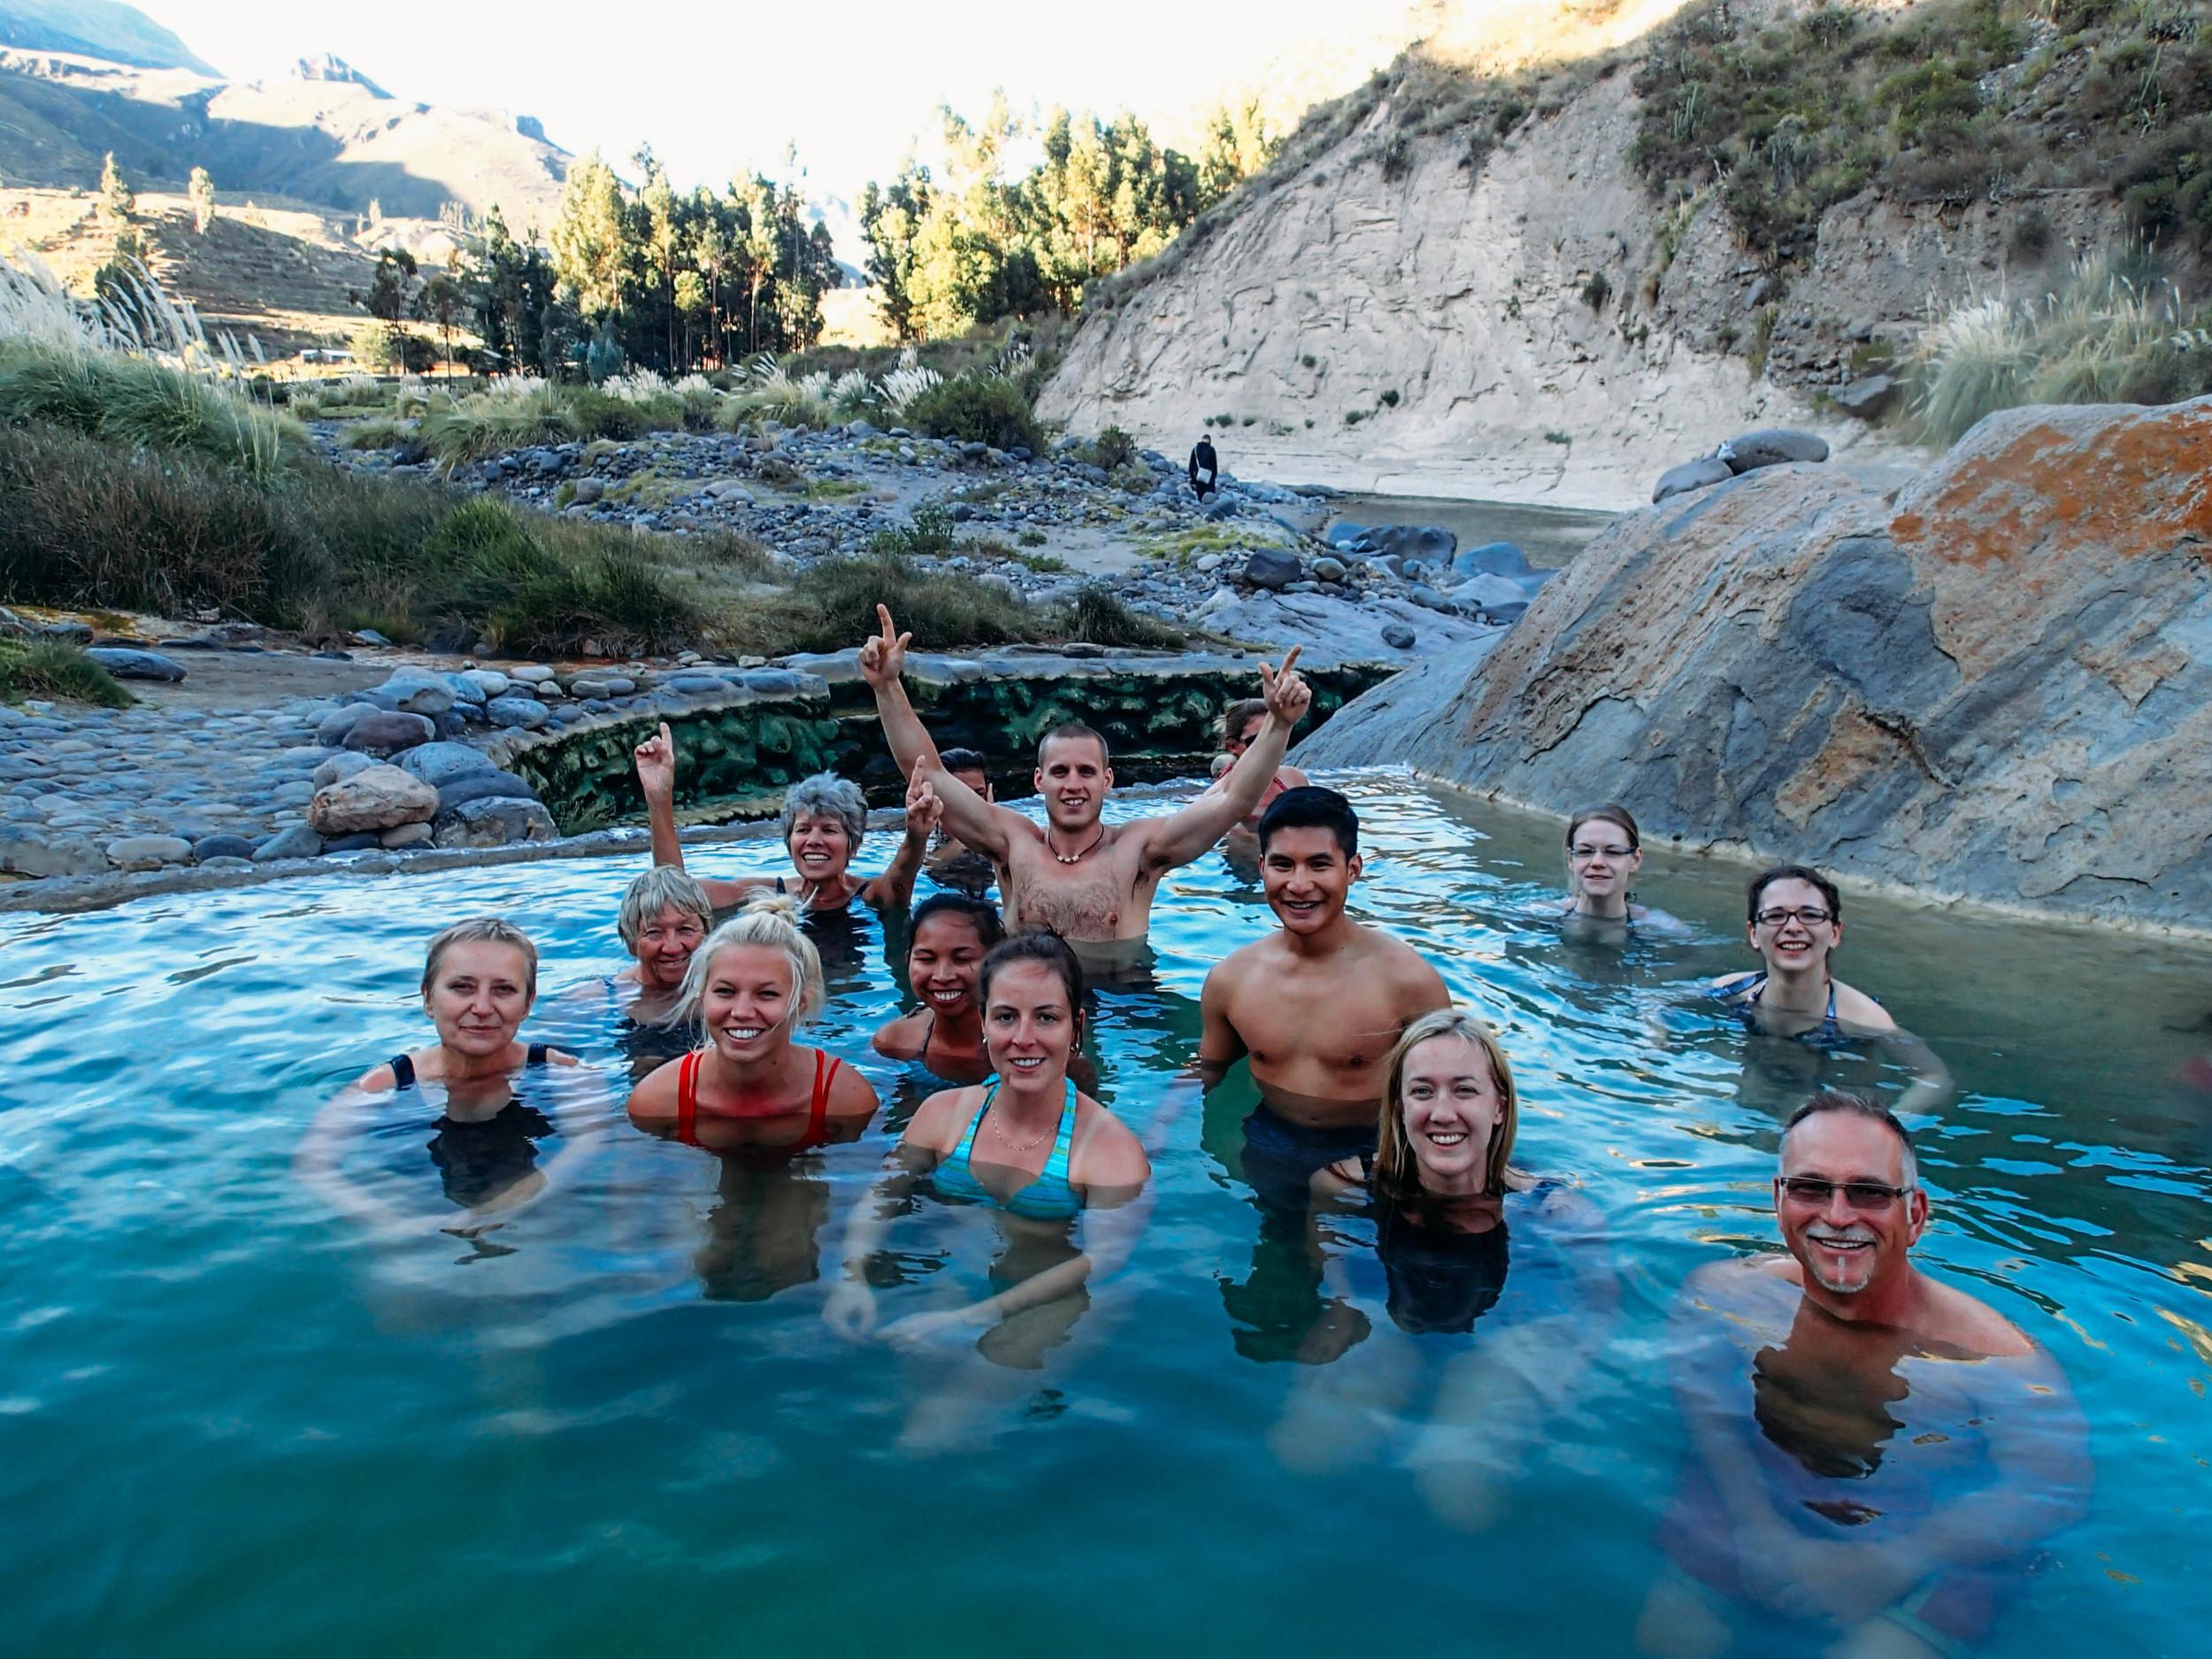 Group shot at the hot springs